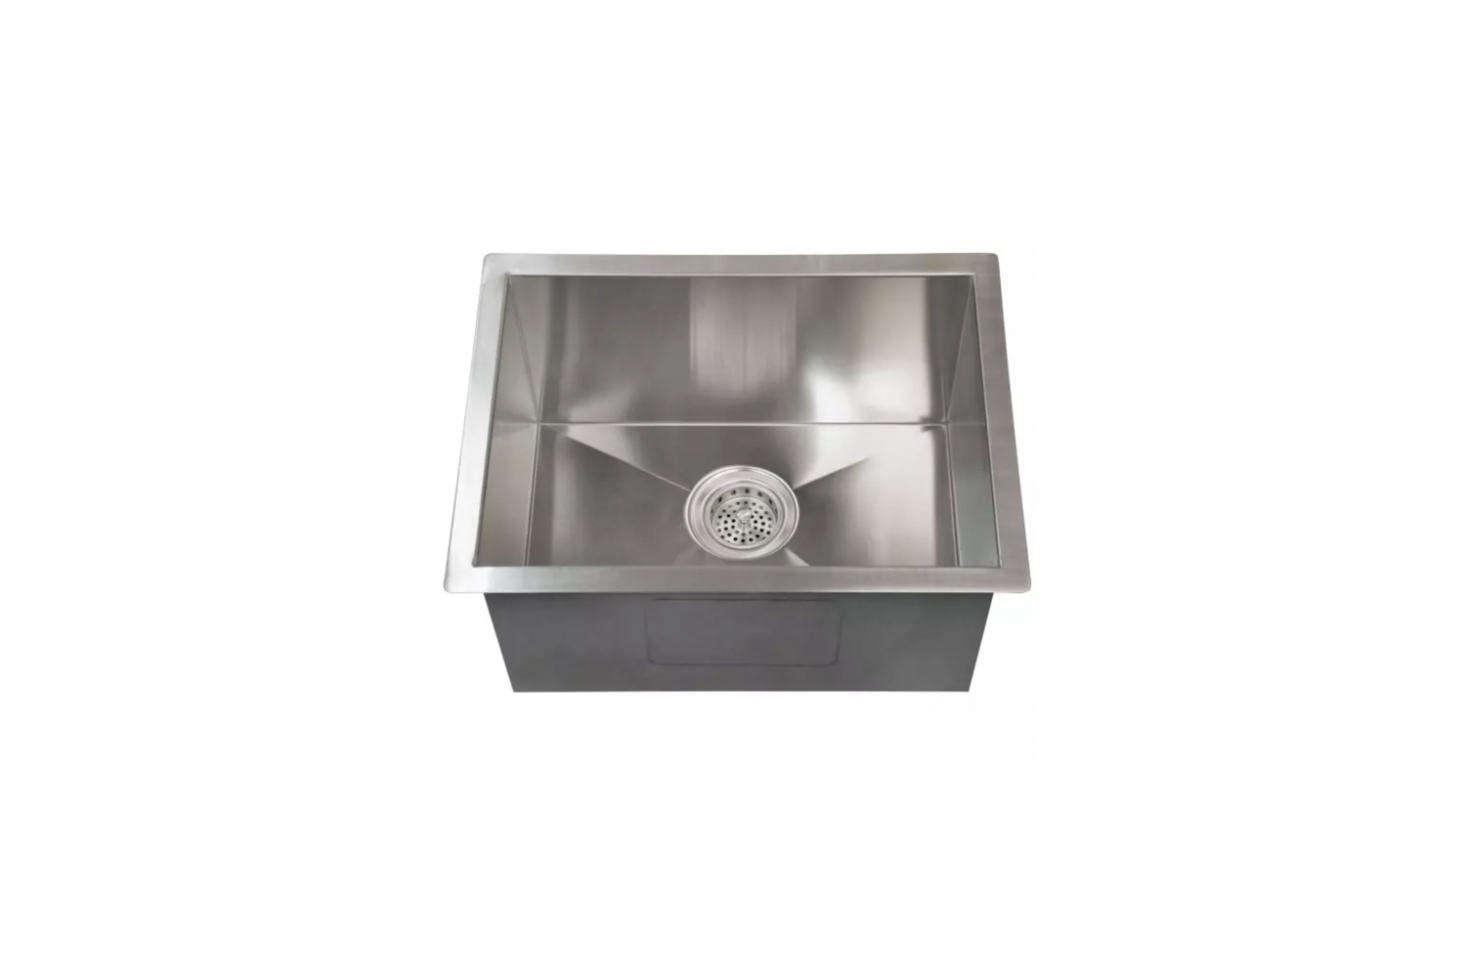 The Signature Hardware Executive Zero-Radius Stainless Steel Undermount Sink is $9.